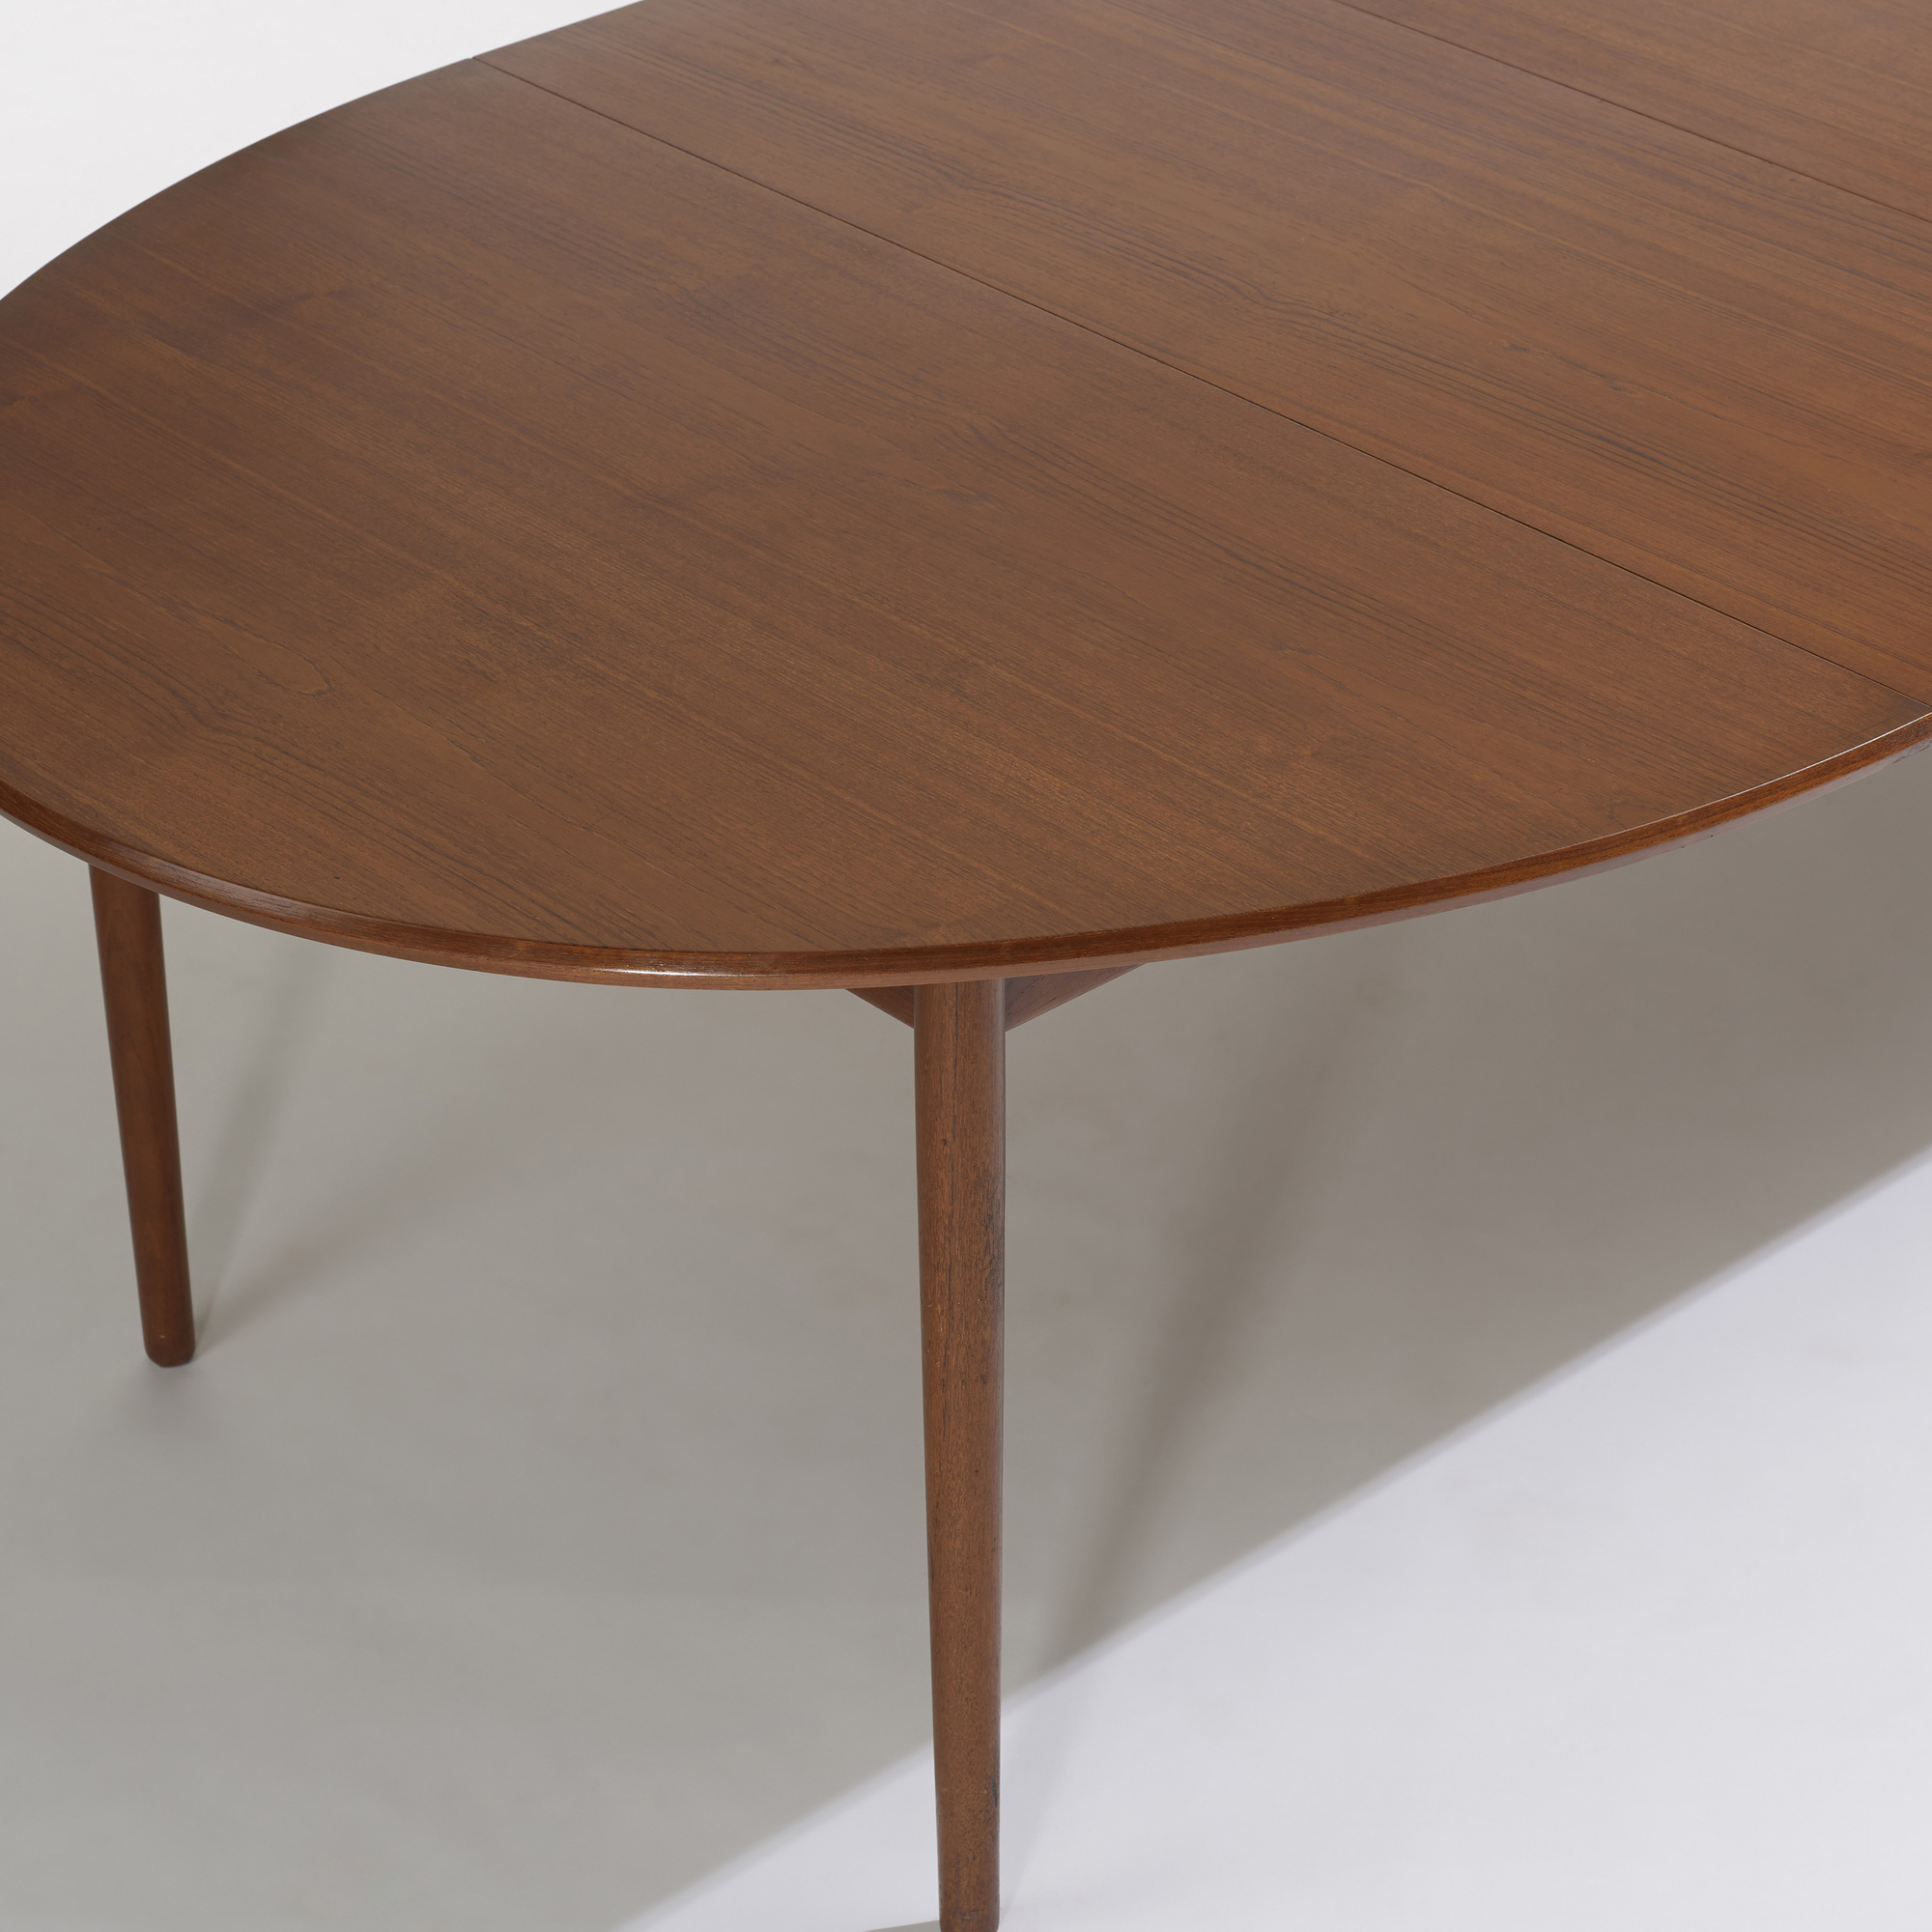 396: Ib Kofod-Larsen / dining table (2 of 3)